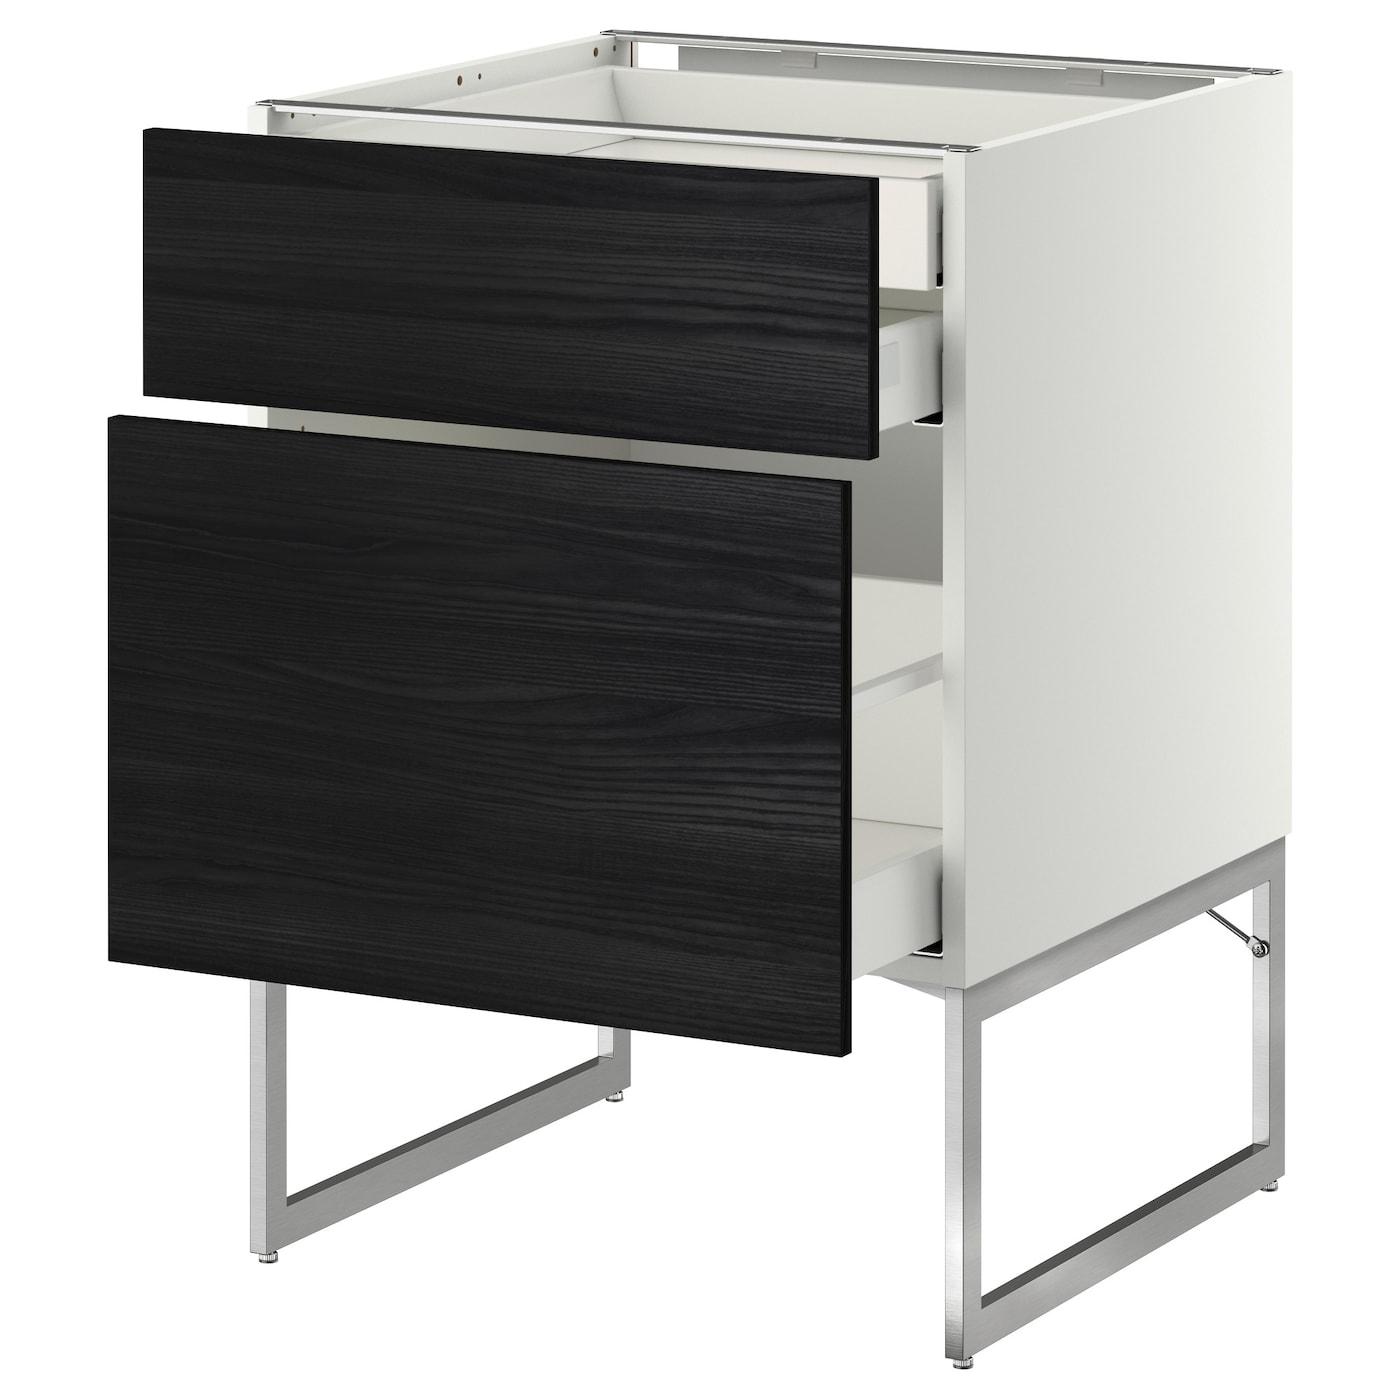 metod maximera base cab 2 frnts 2 low 1 hi drwr white tingsryd black 60x60x60 cm ikea. Black Bedroom Furniture Sets. Home Design Ideas